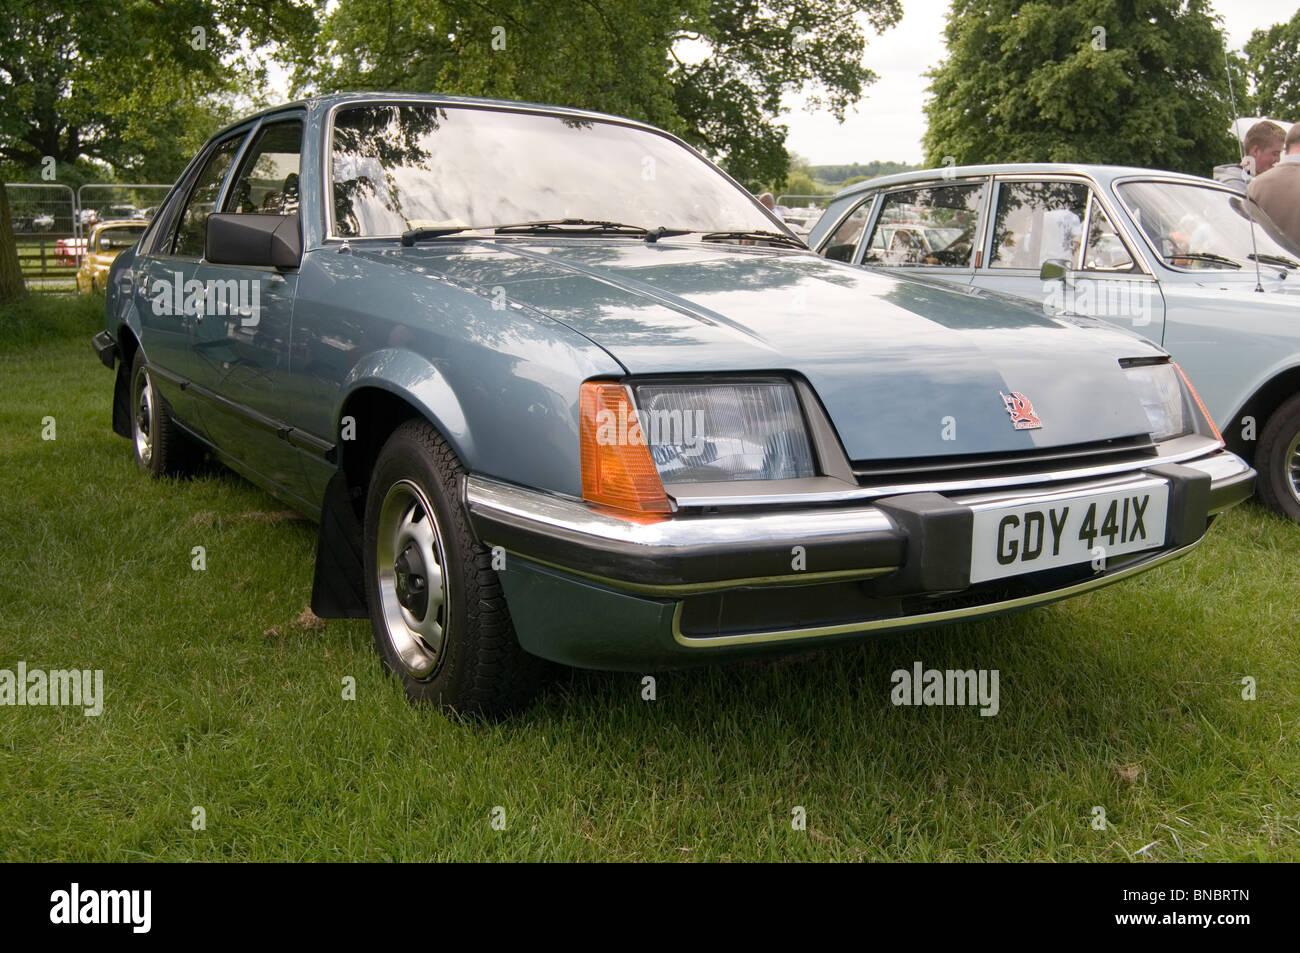 Vauxhall carlton 80's, 80's repmobile general motors coches coches clásicos mostrar muestra mostrando Imagen De Stock